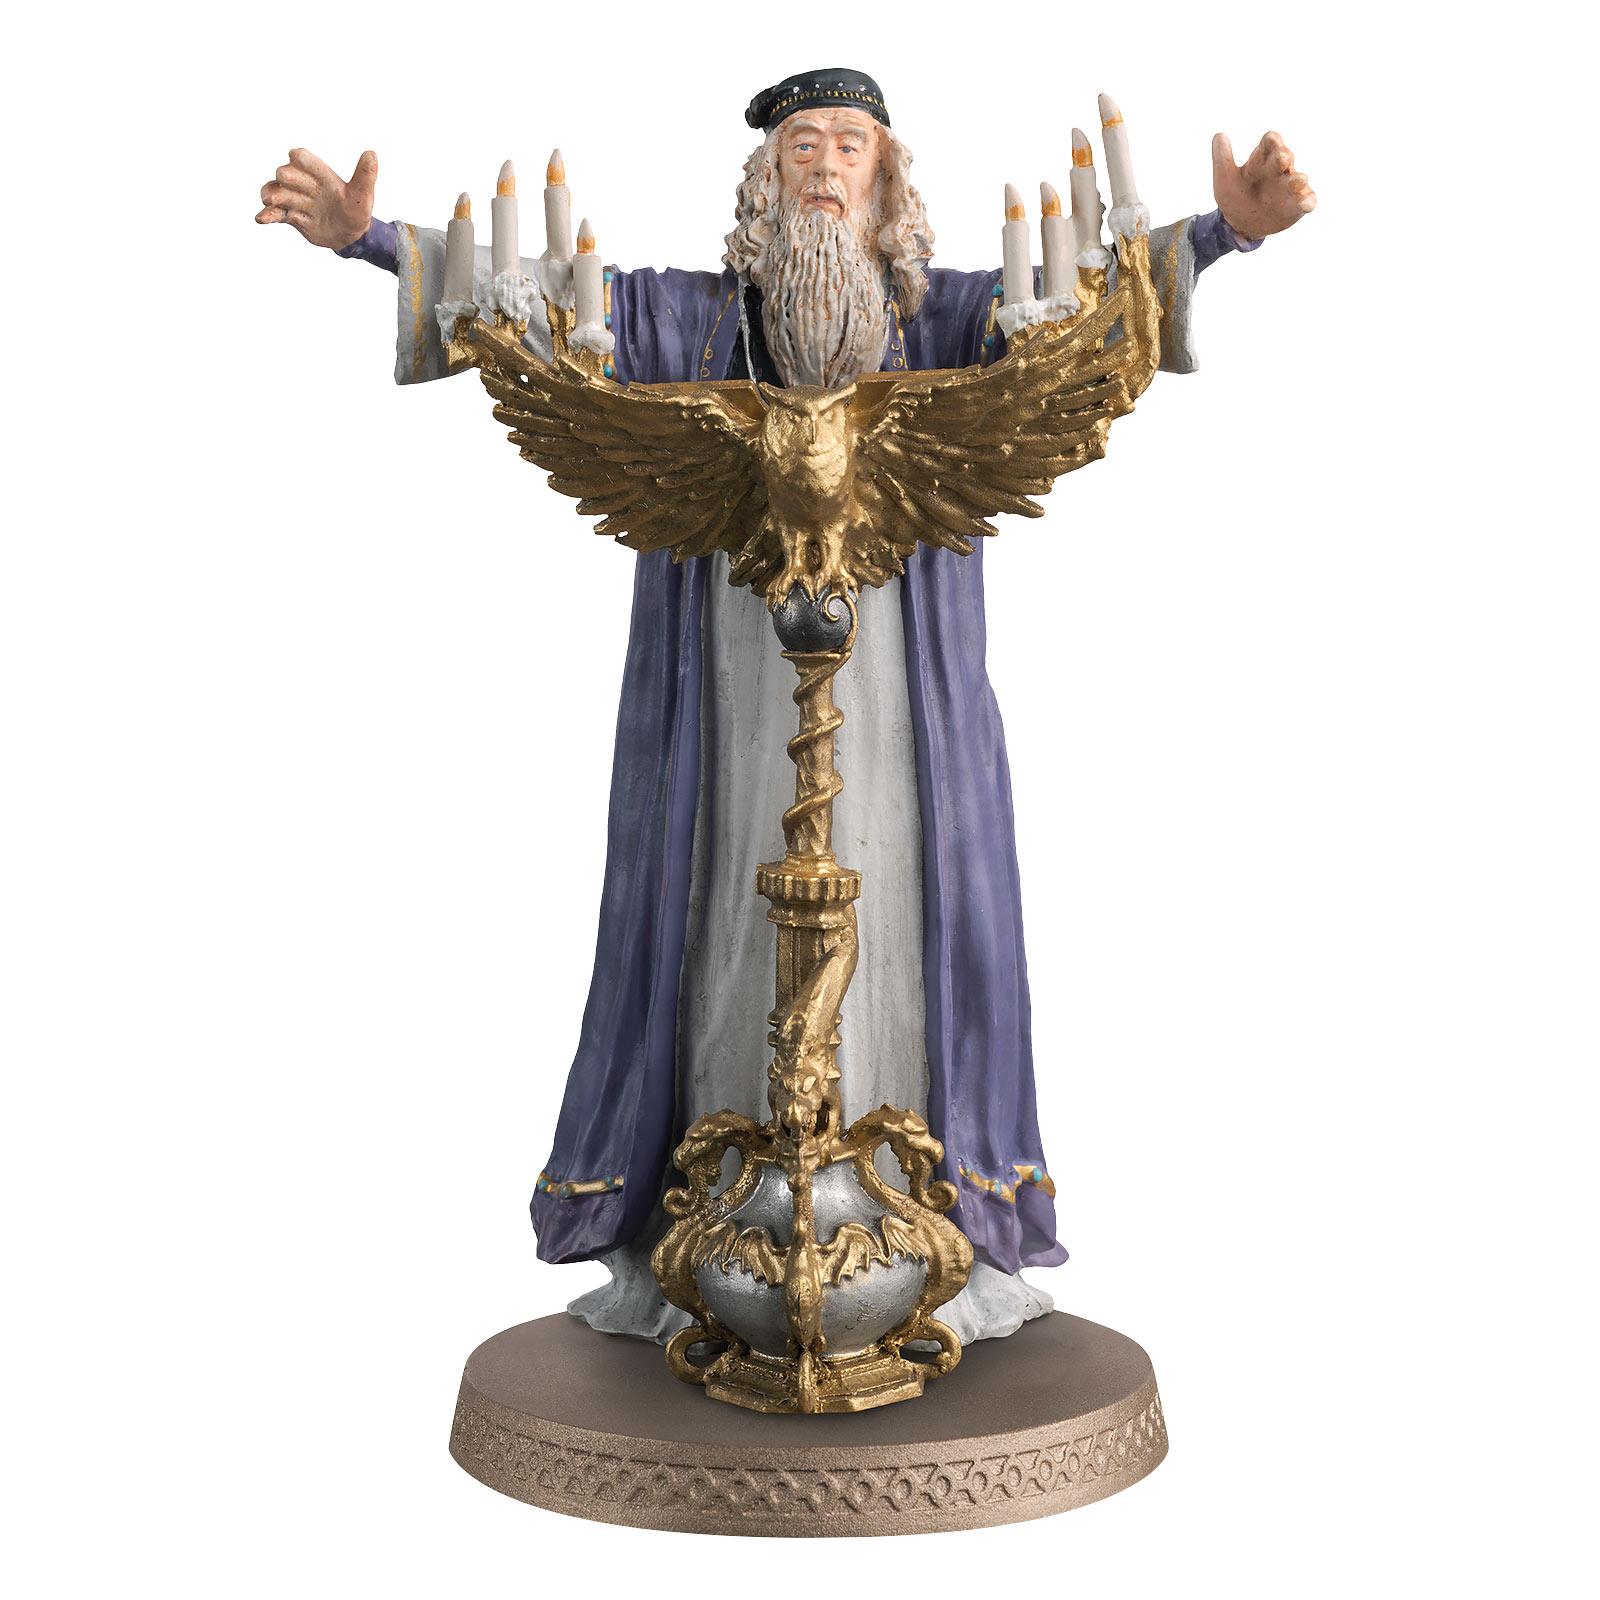 Albus Dumbledore Hero Collector Figur 12 cm - Harry Potter